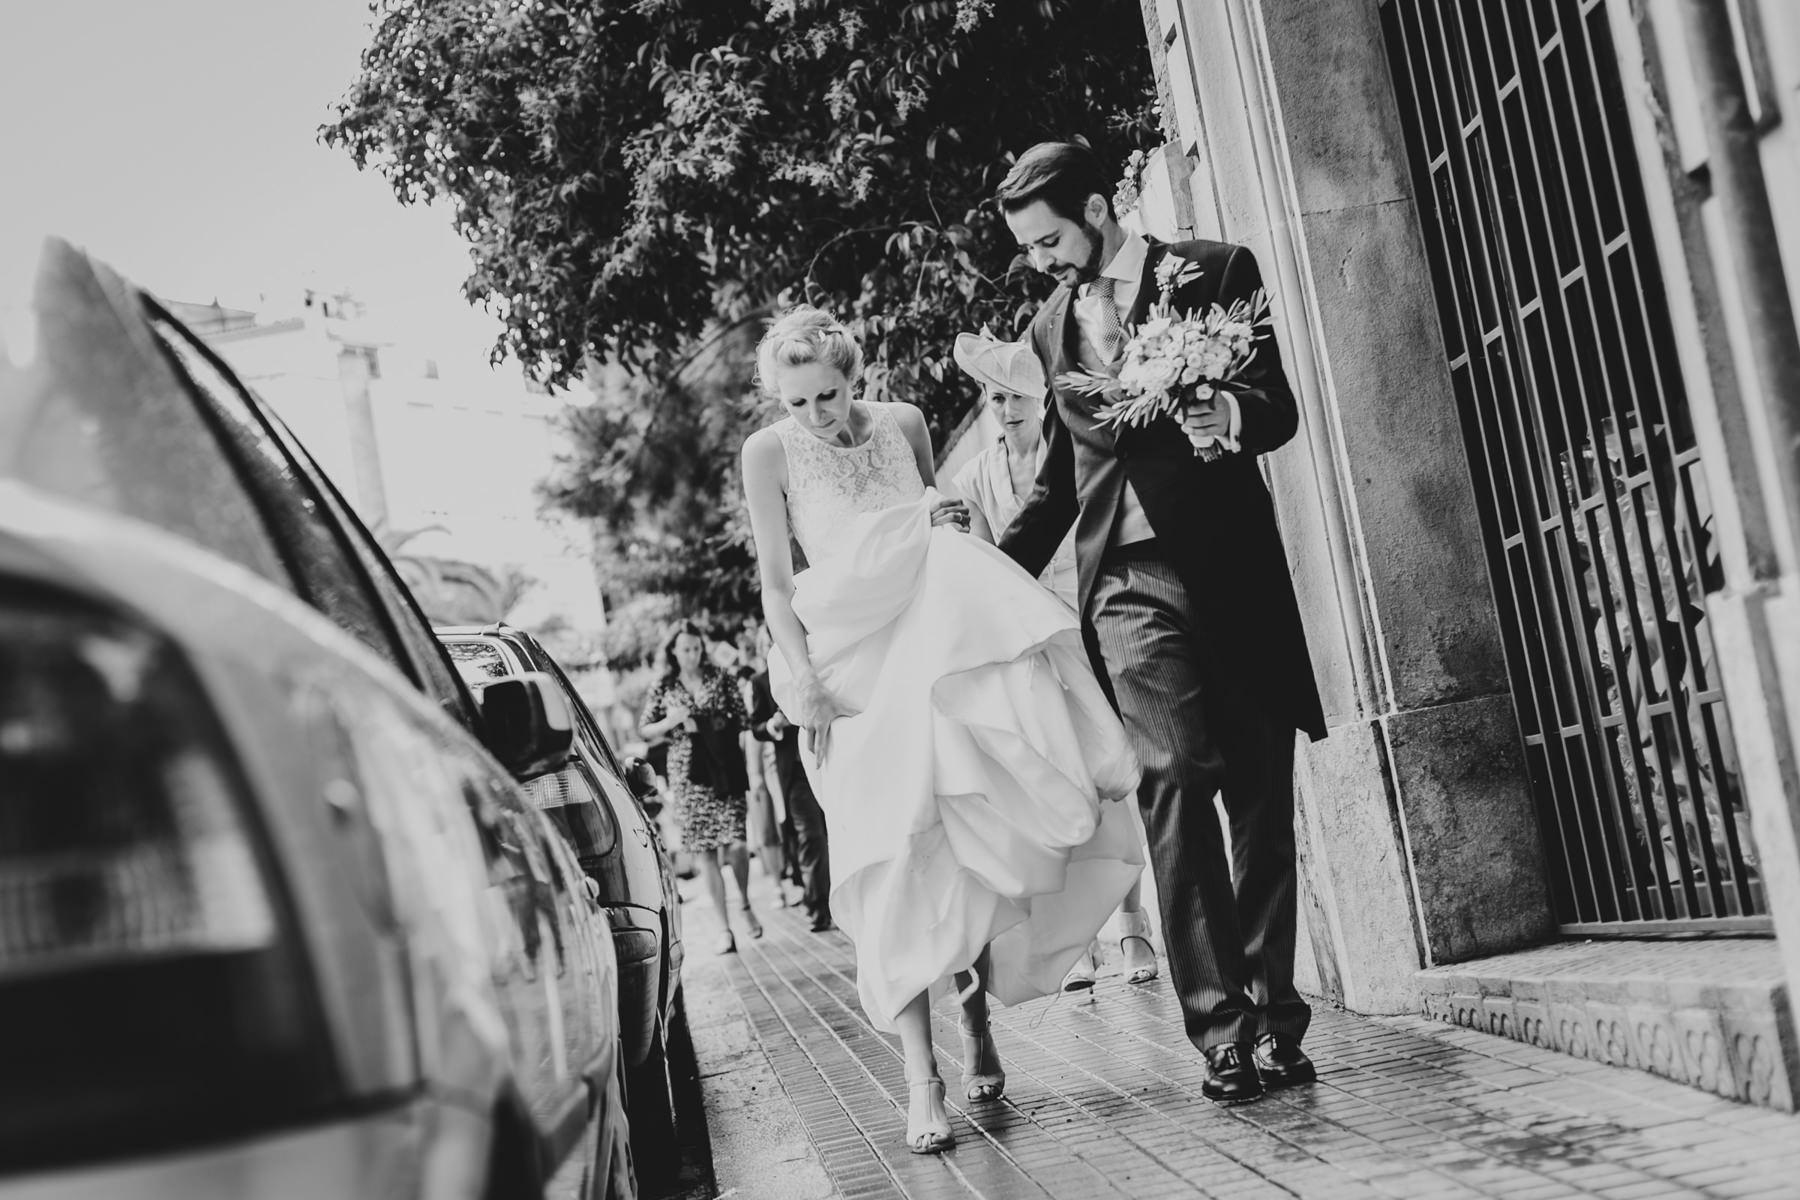 Wedding_Photography_Carlos_Hevia_Barcelona_Berlin_22.jpg